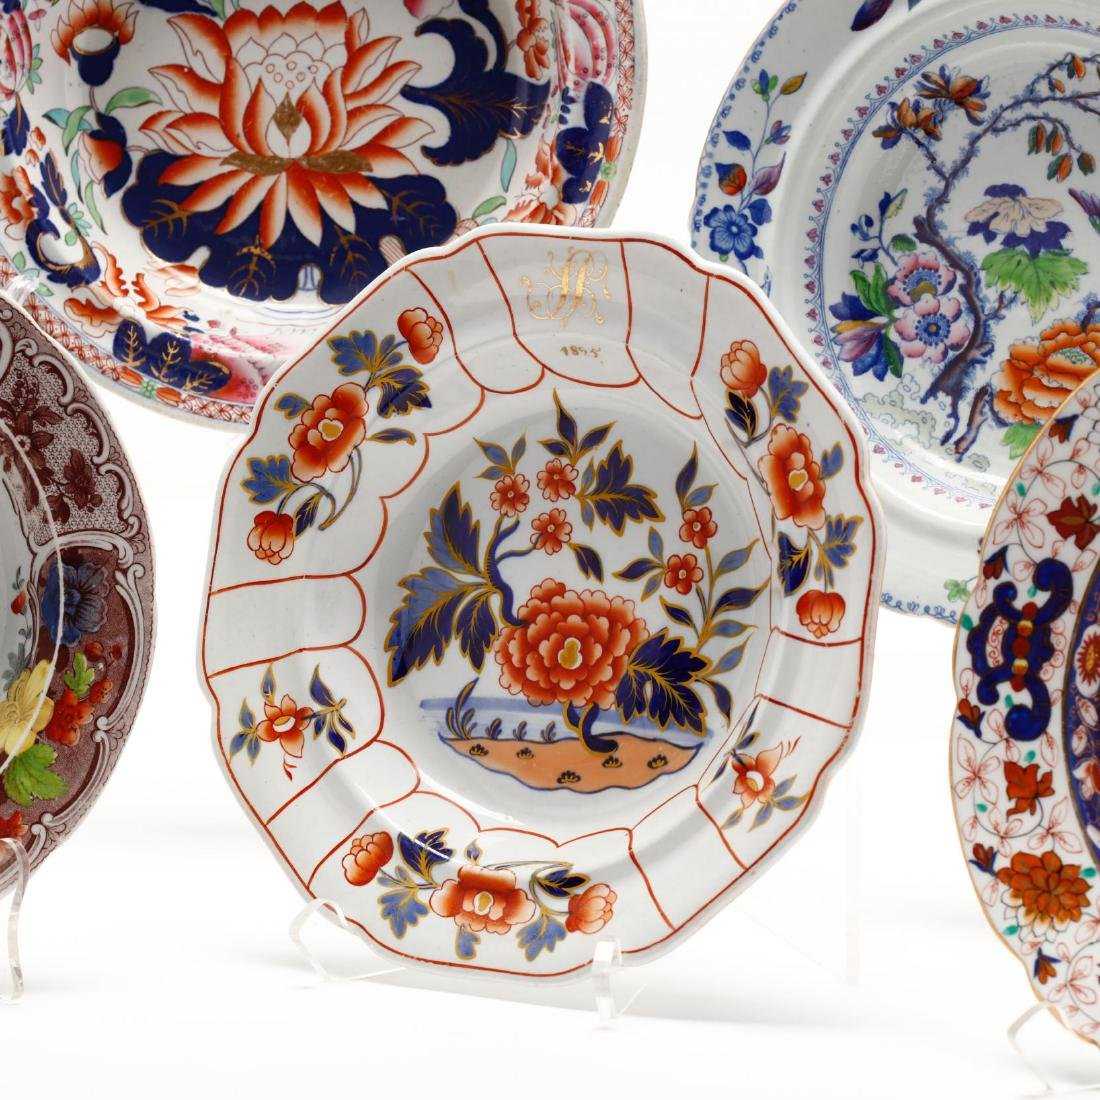 A Collection of Antique Soup Bowls - 6